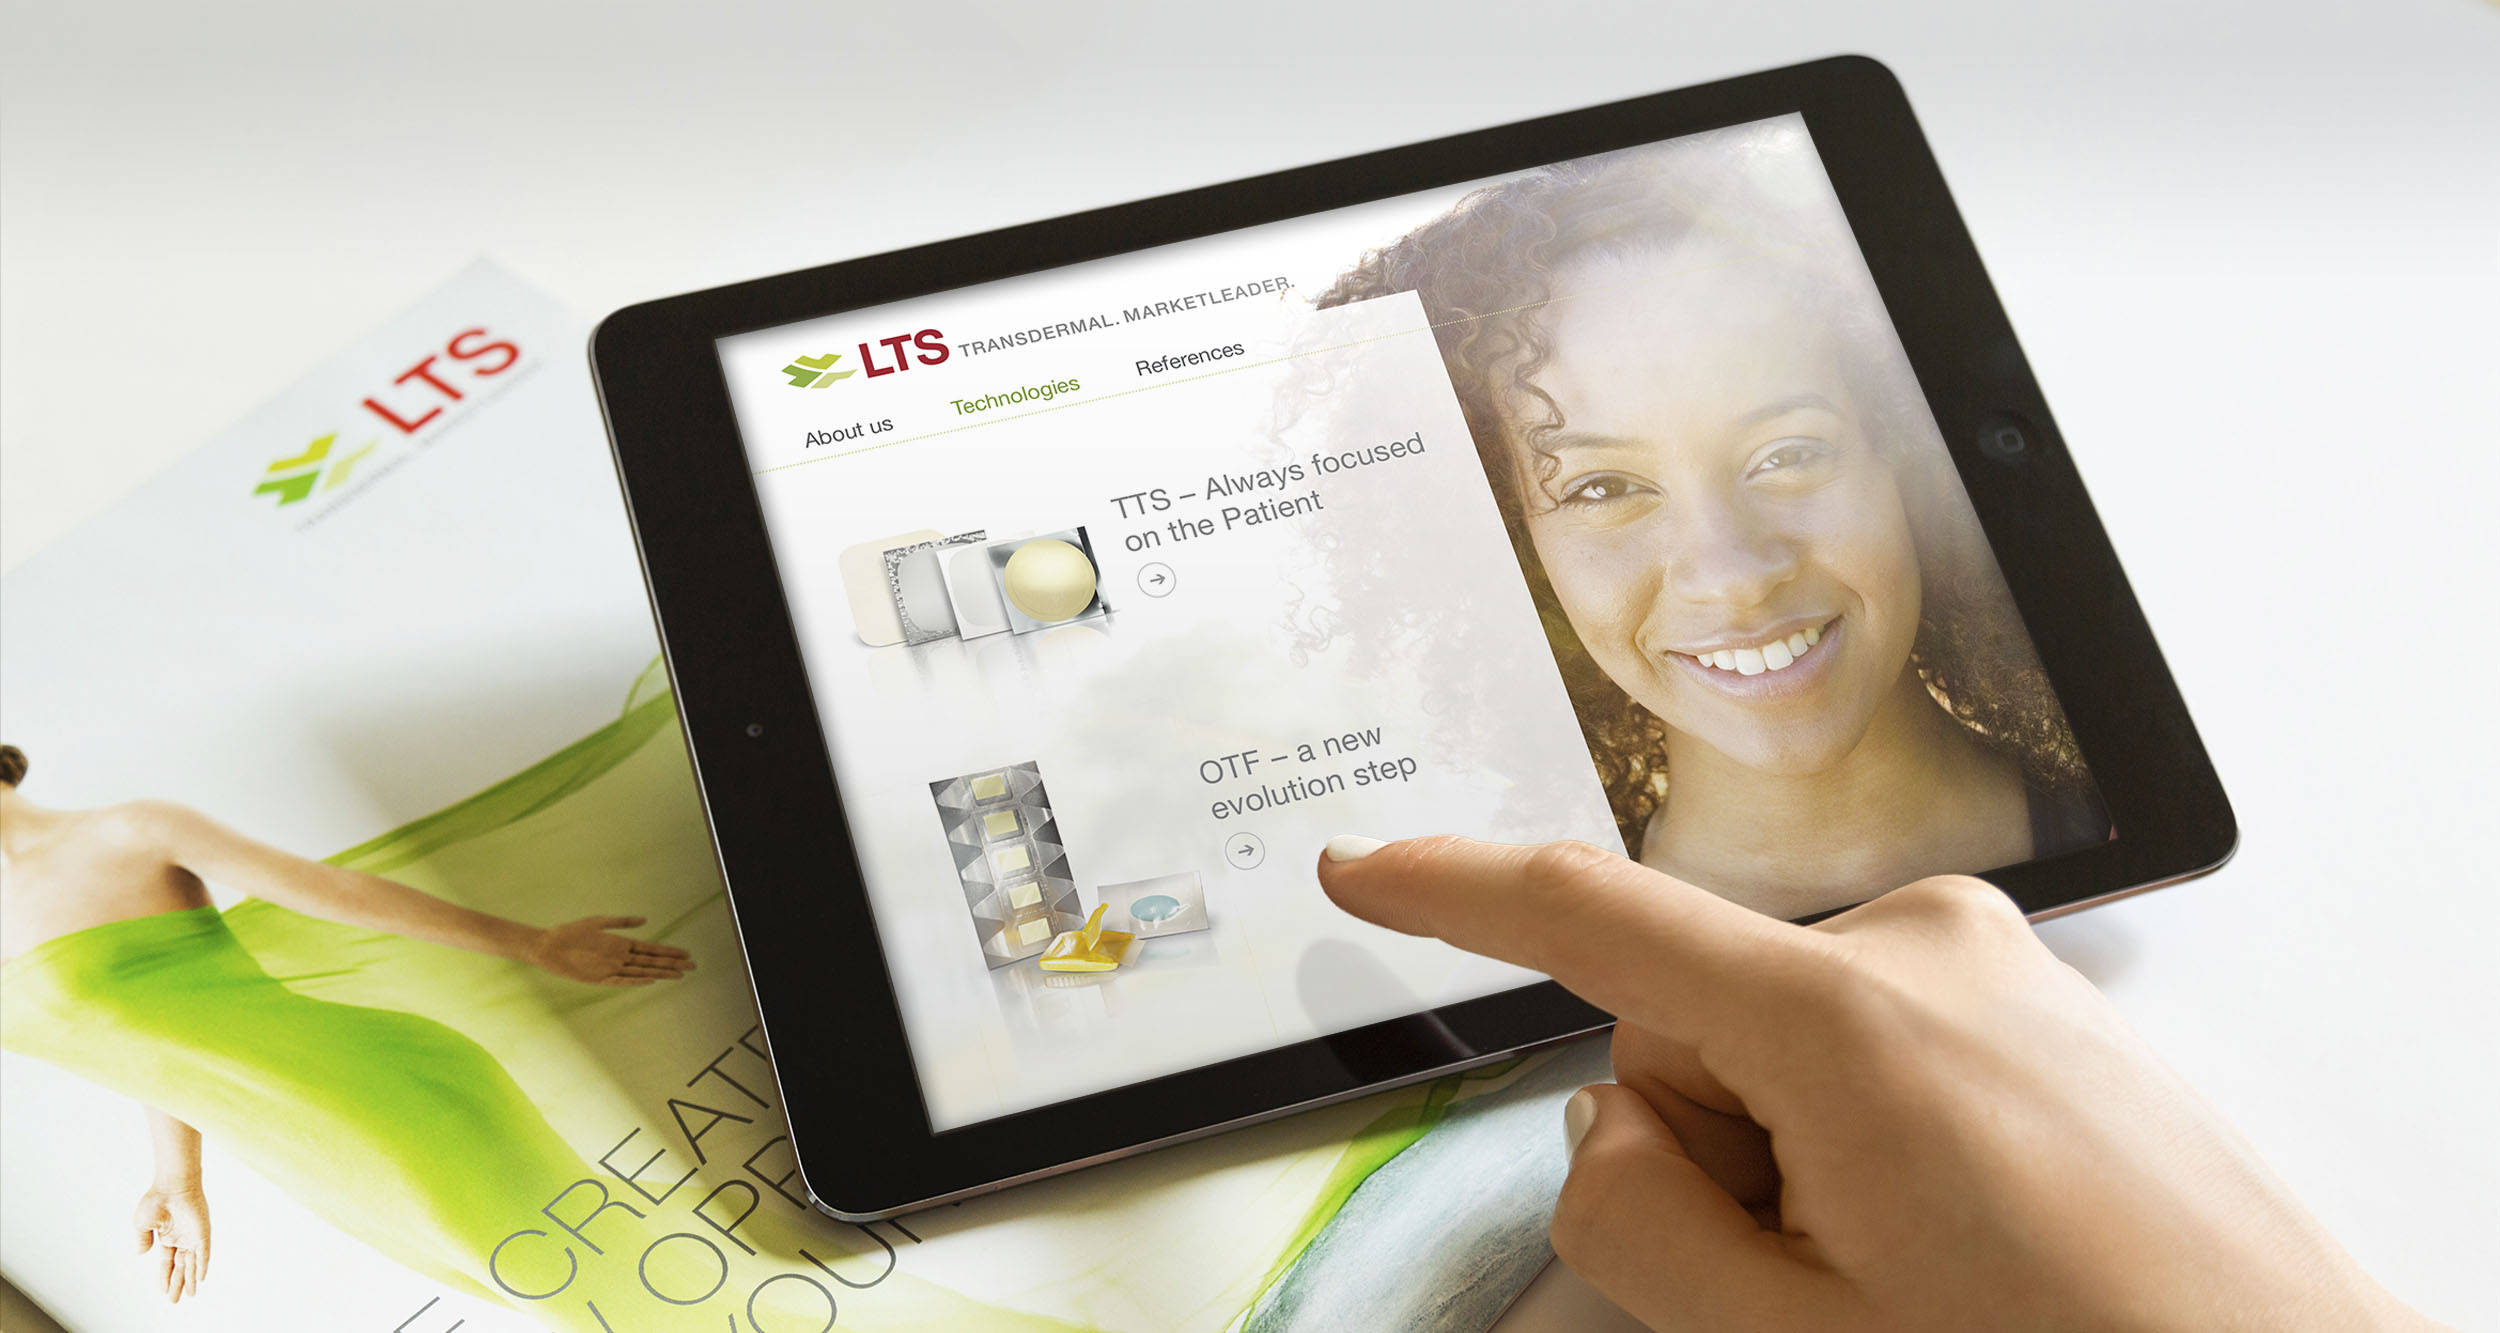 8 – LTS – digitale Produkpraesentation